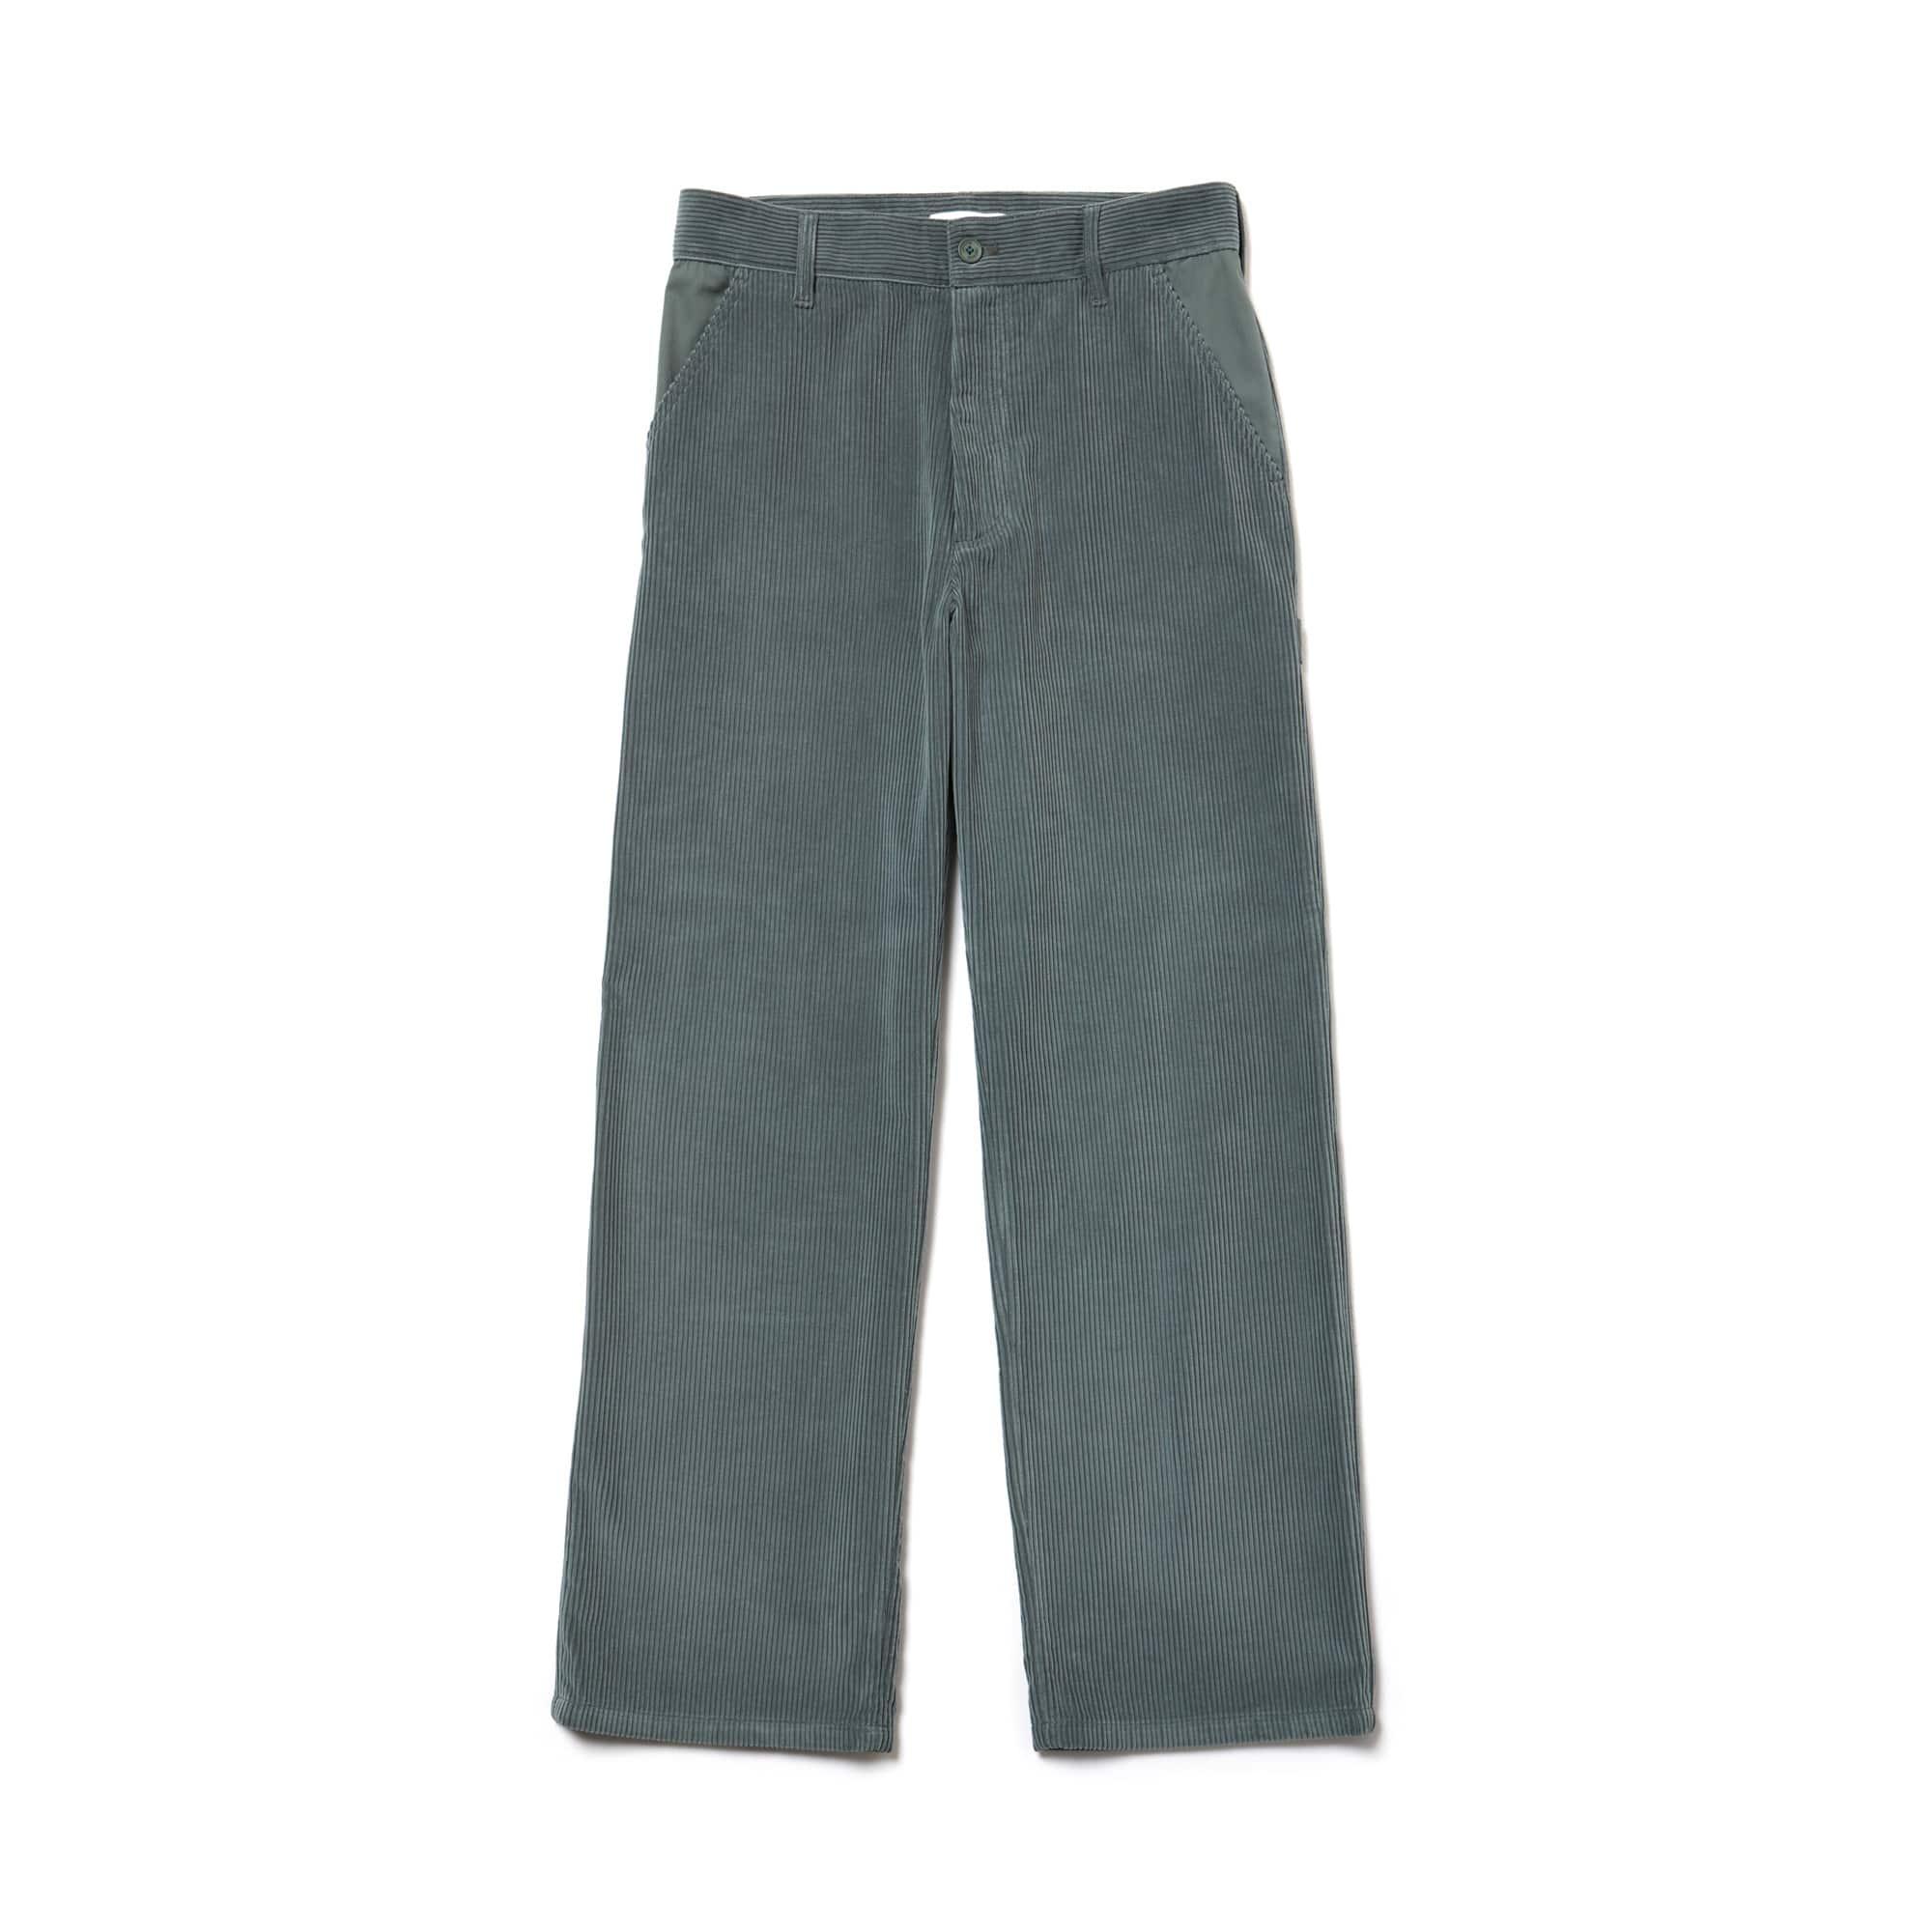 Men's Fashion Show Boxy Fit Ribbed Italian Velour Pants